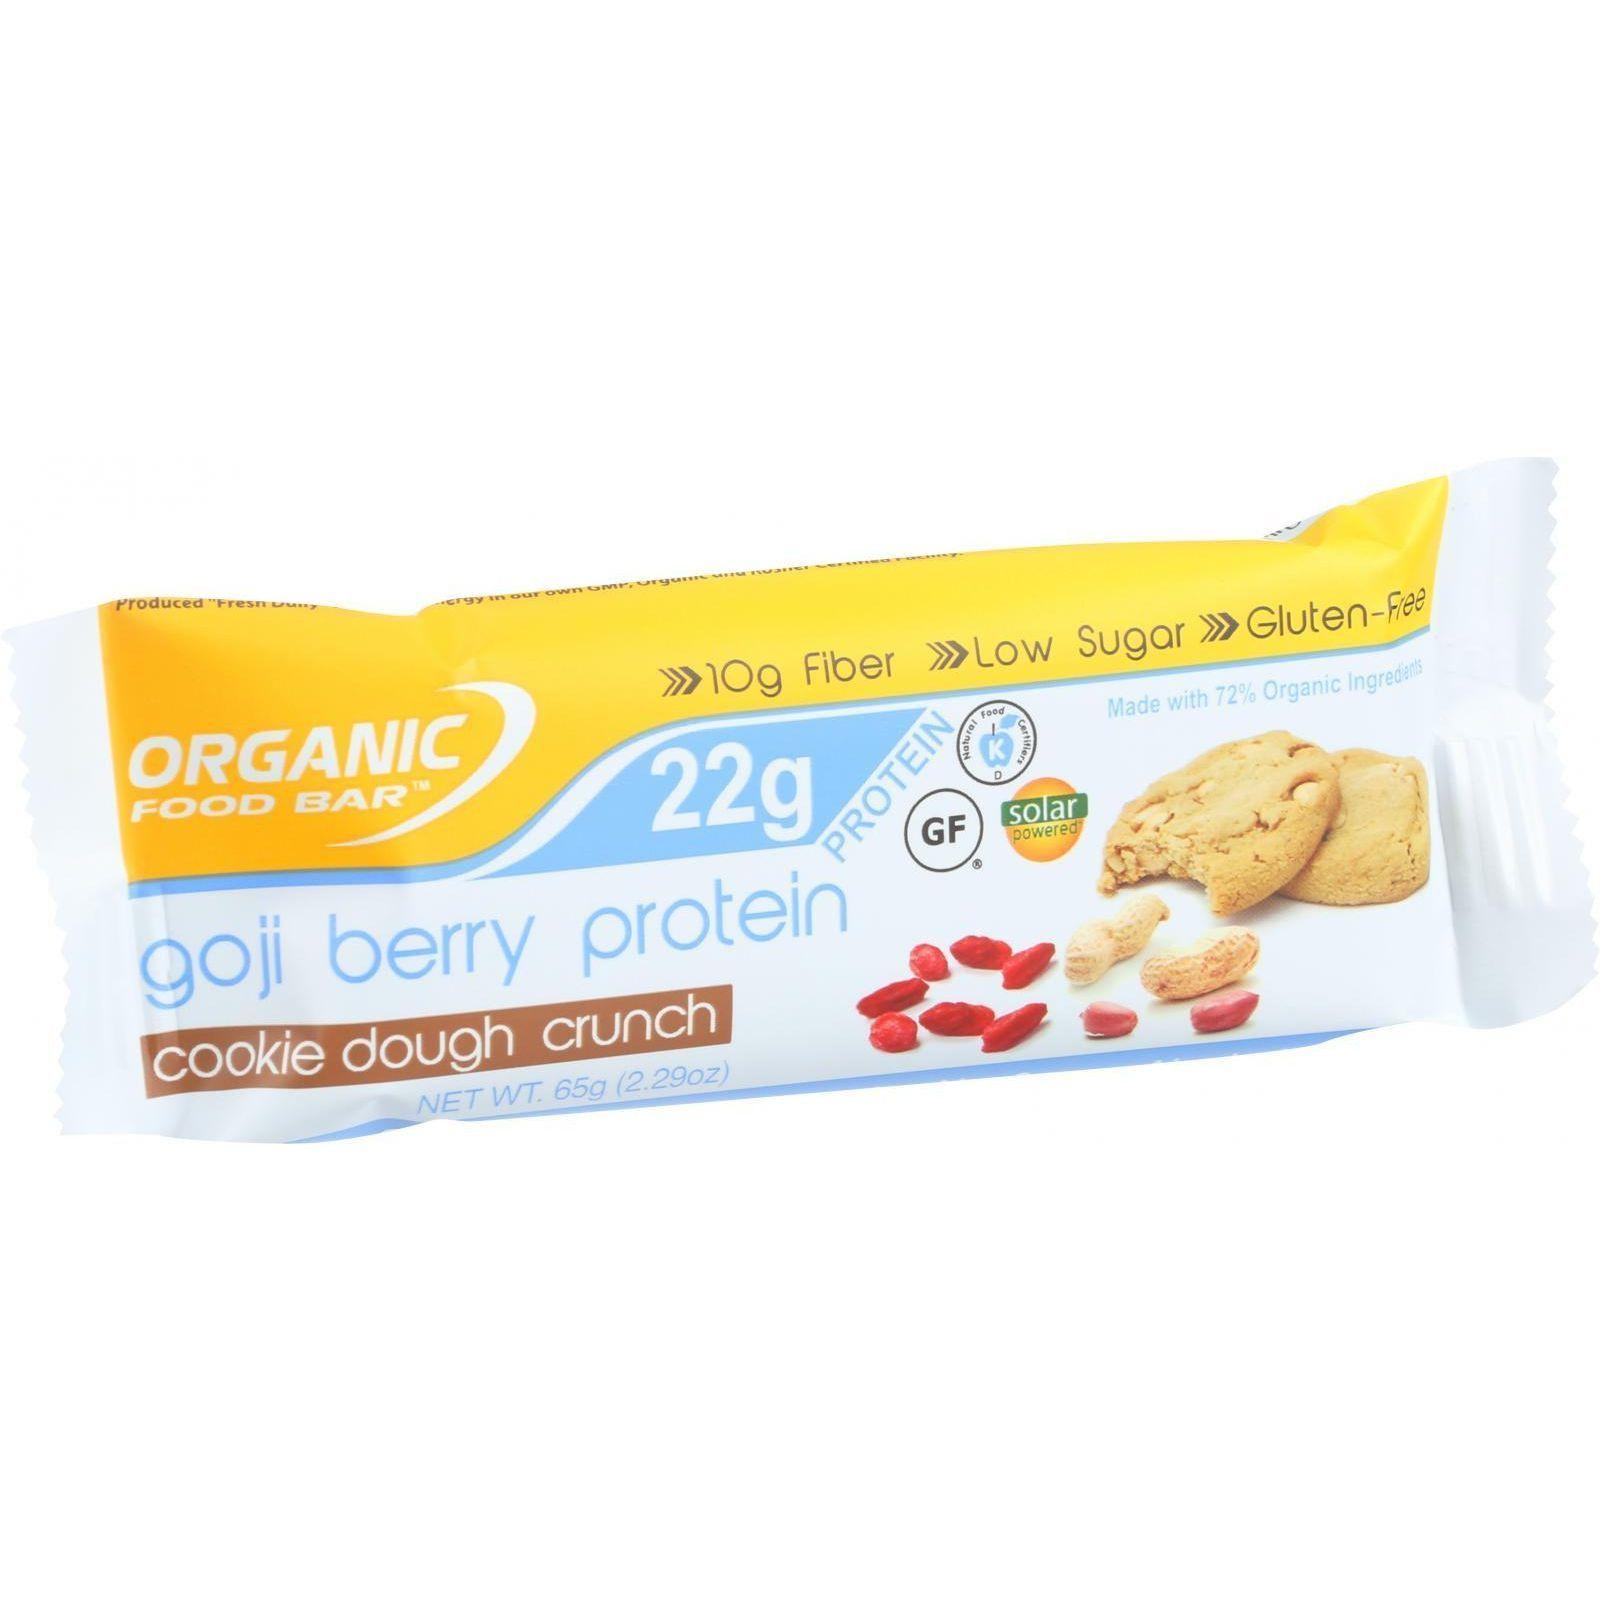 Organic Food Bar Protein Bar Goji Berry Protein Cookie Dough